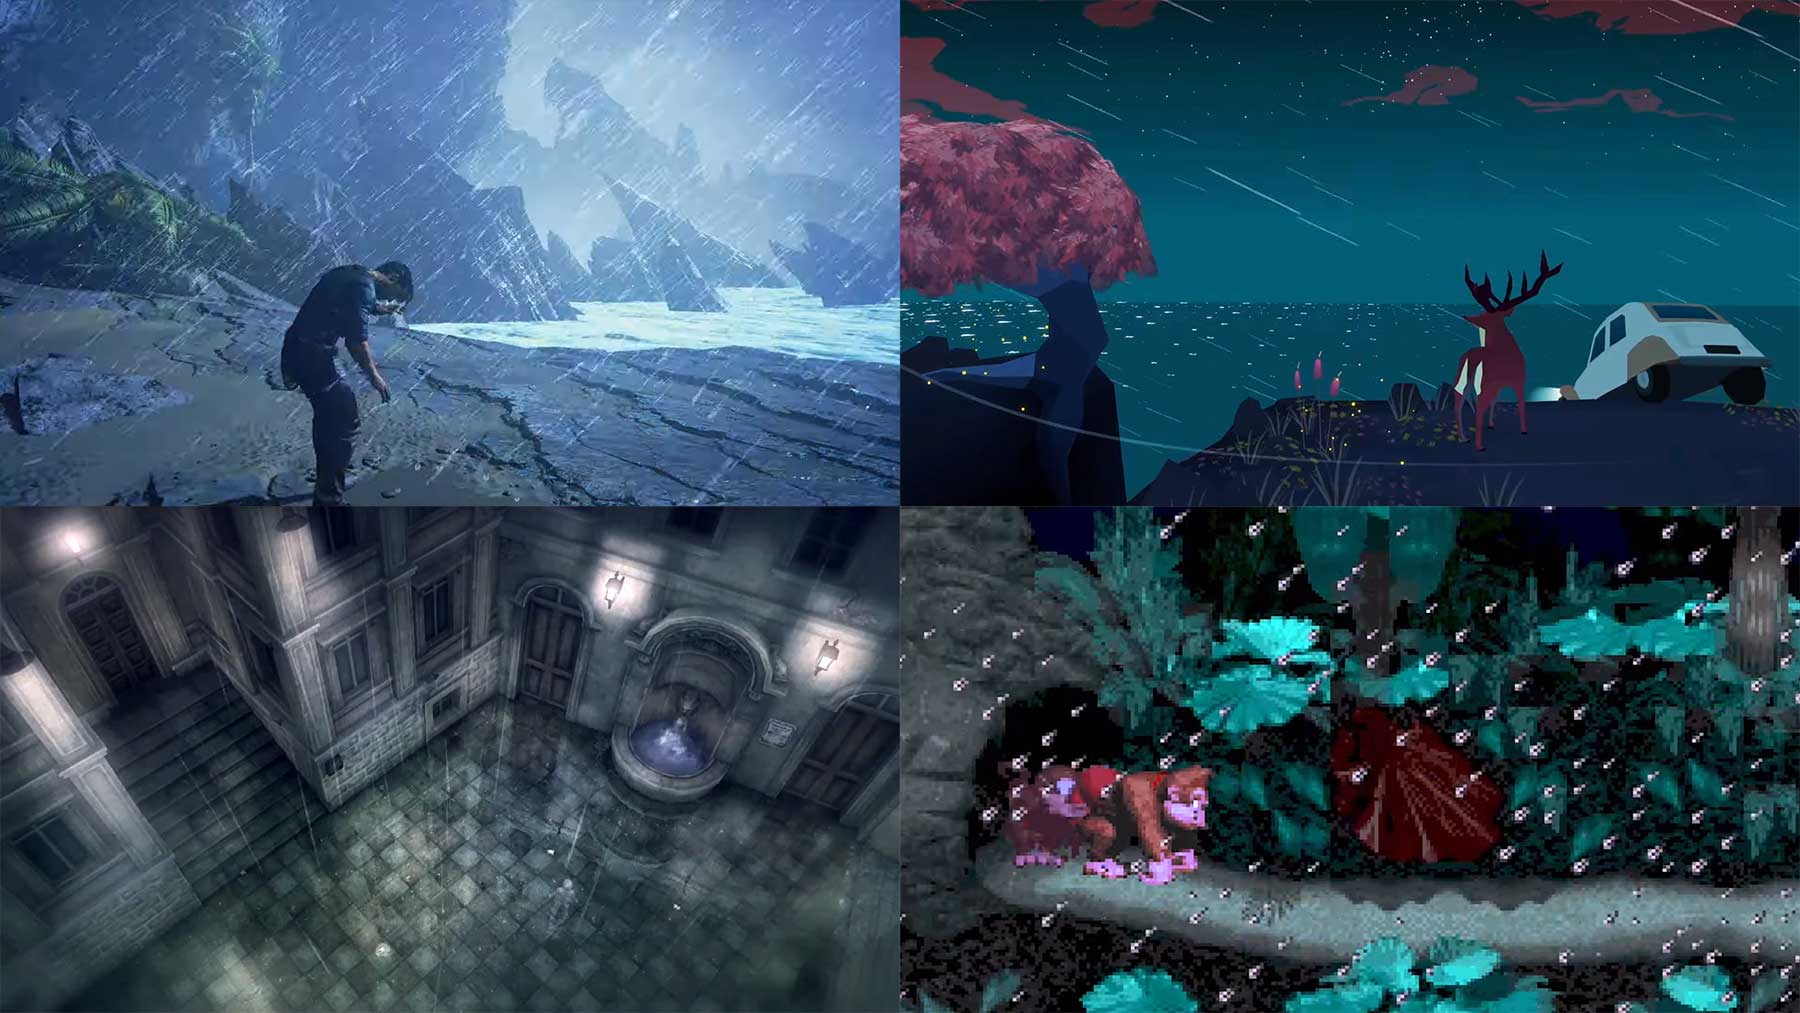 30 Minuten Regen in Videospielen